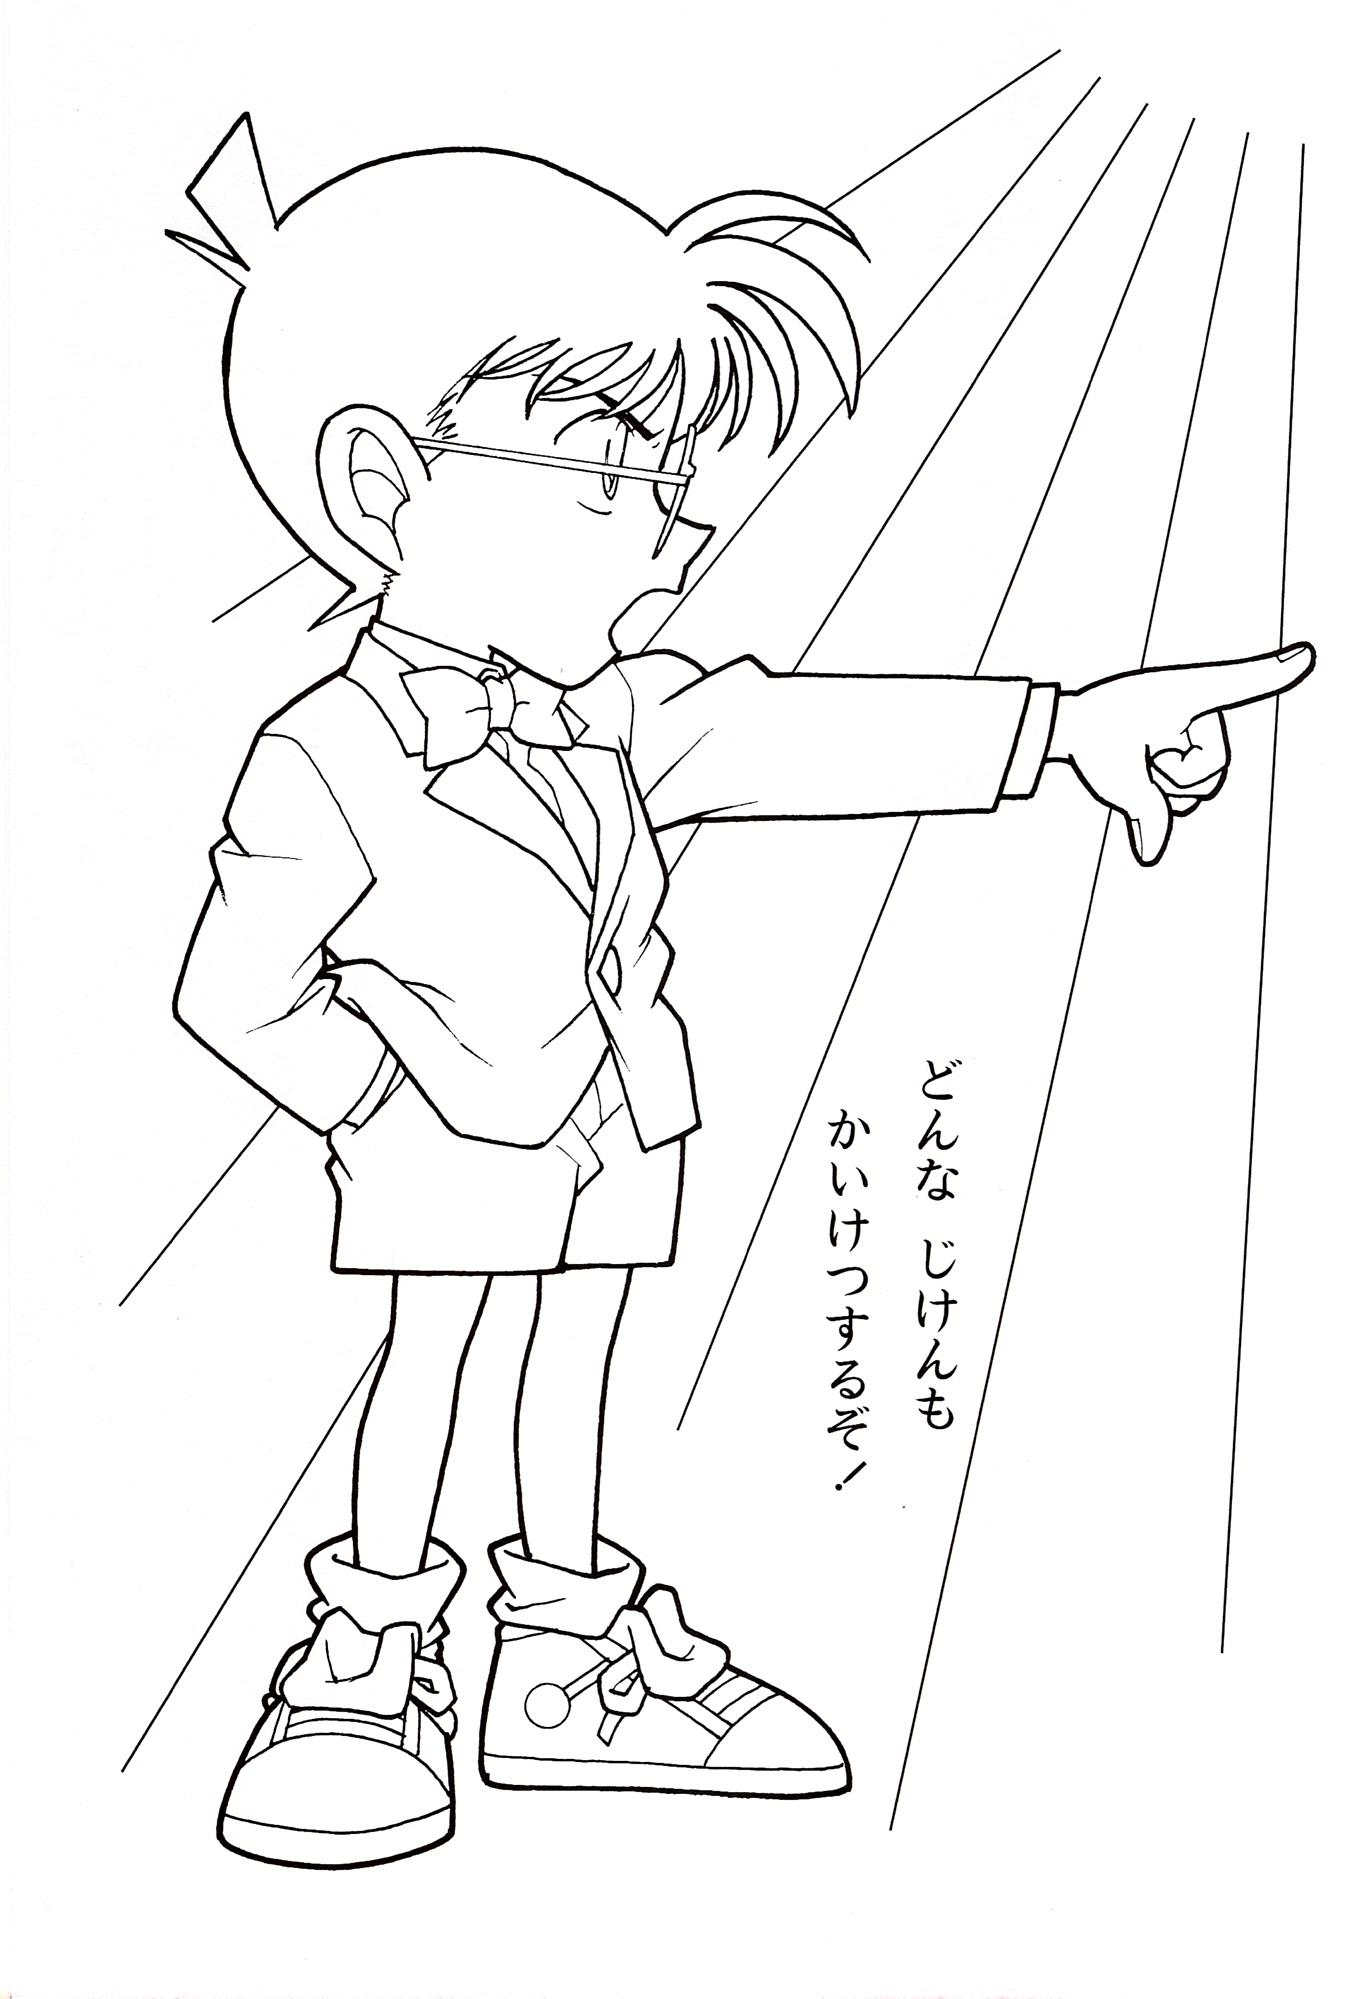 Conan Coloring Conan_coloring_book027.jpg